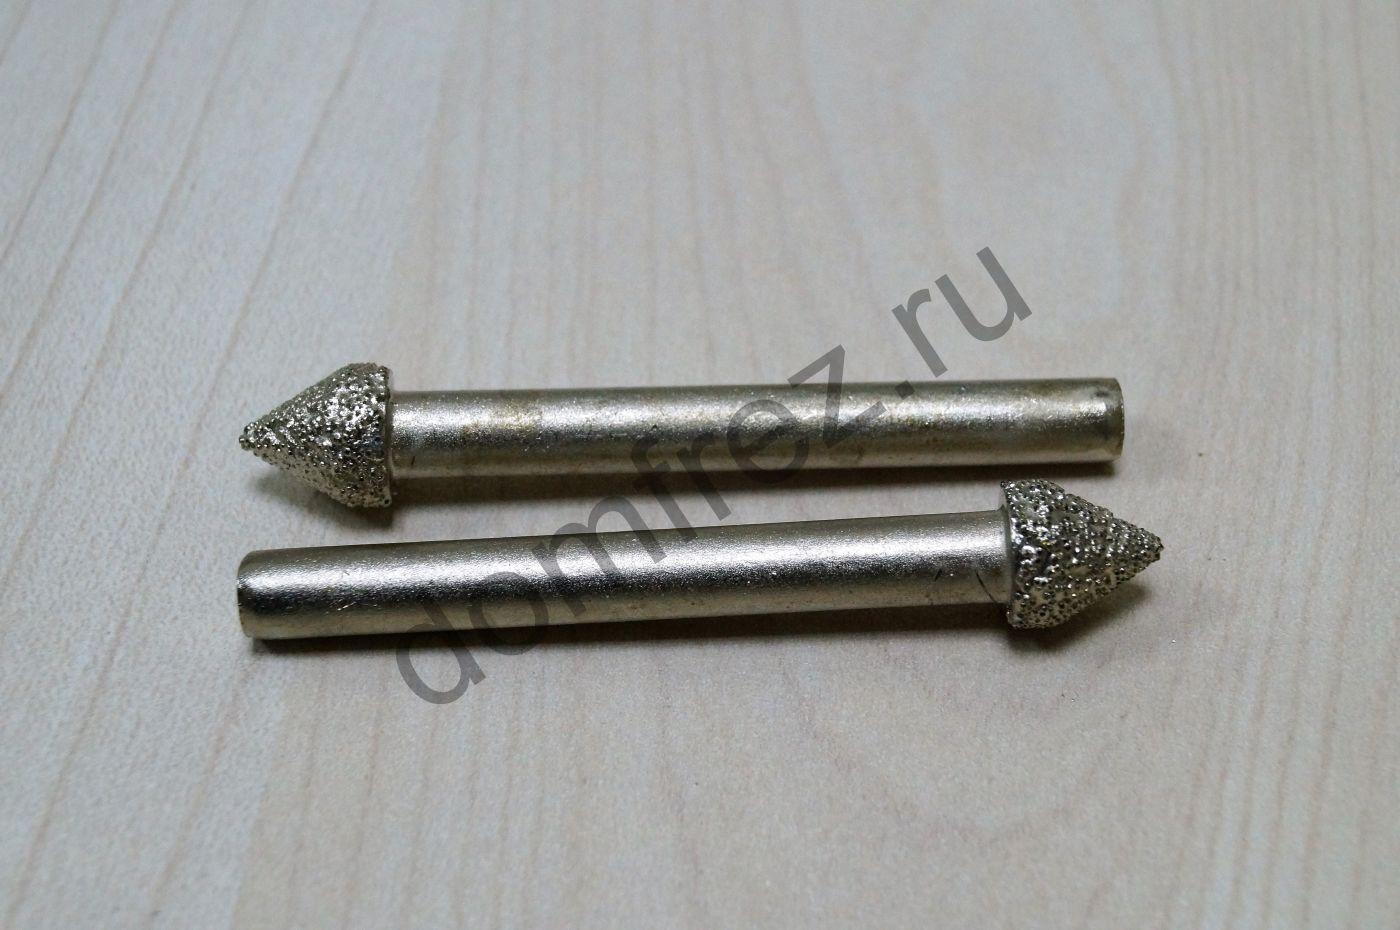 Фреза алмазная концевая фасонная №17 6x10х60x60 A8910617